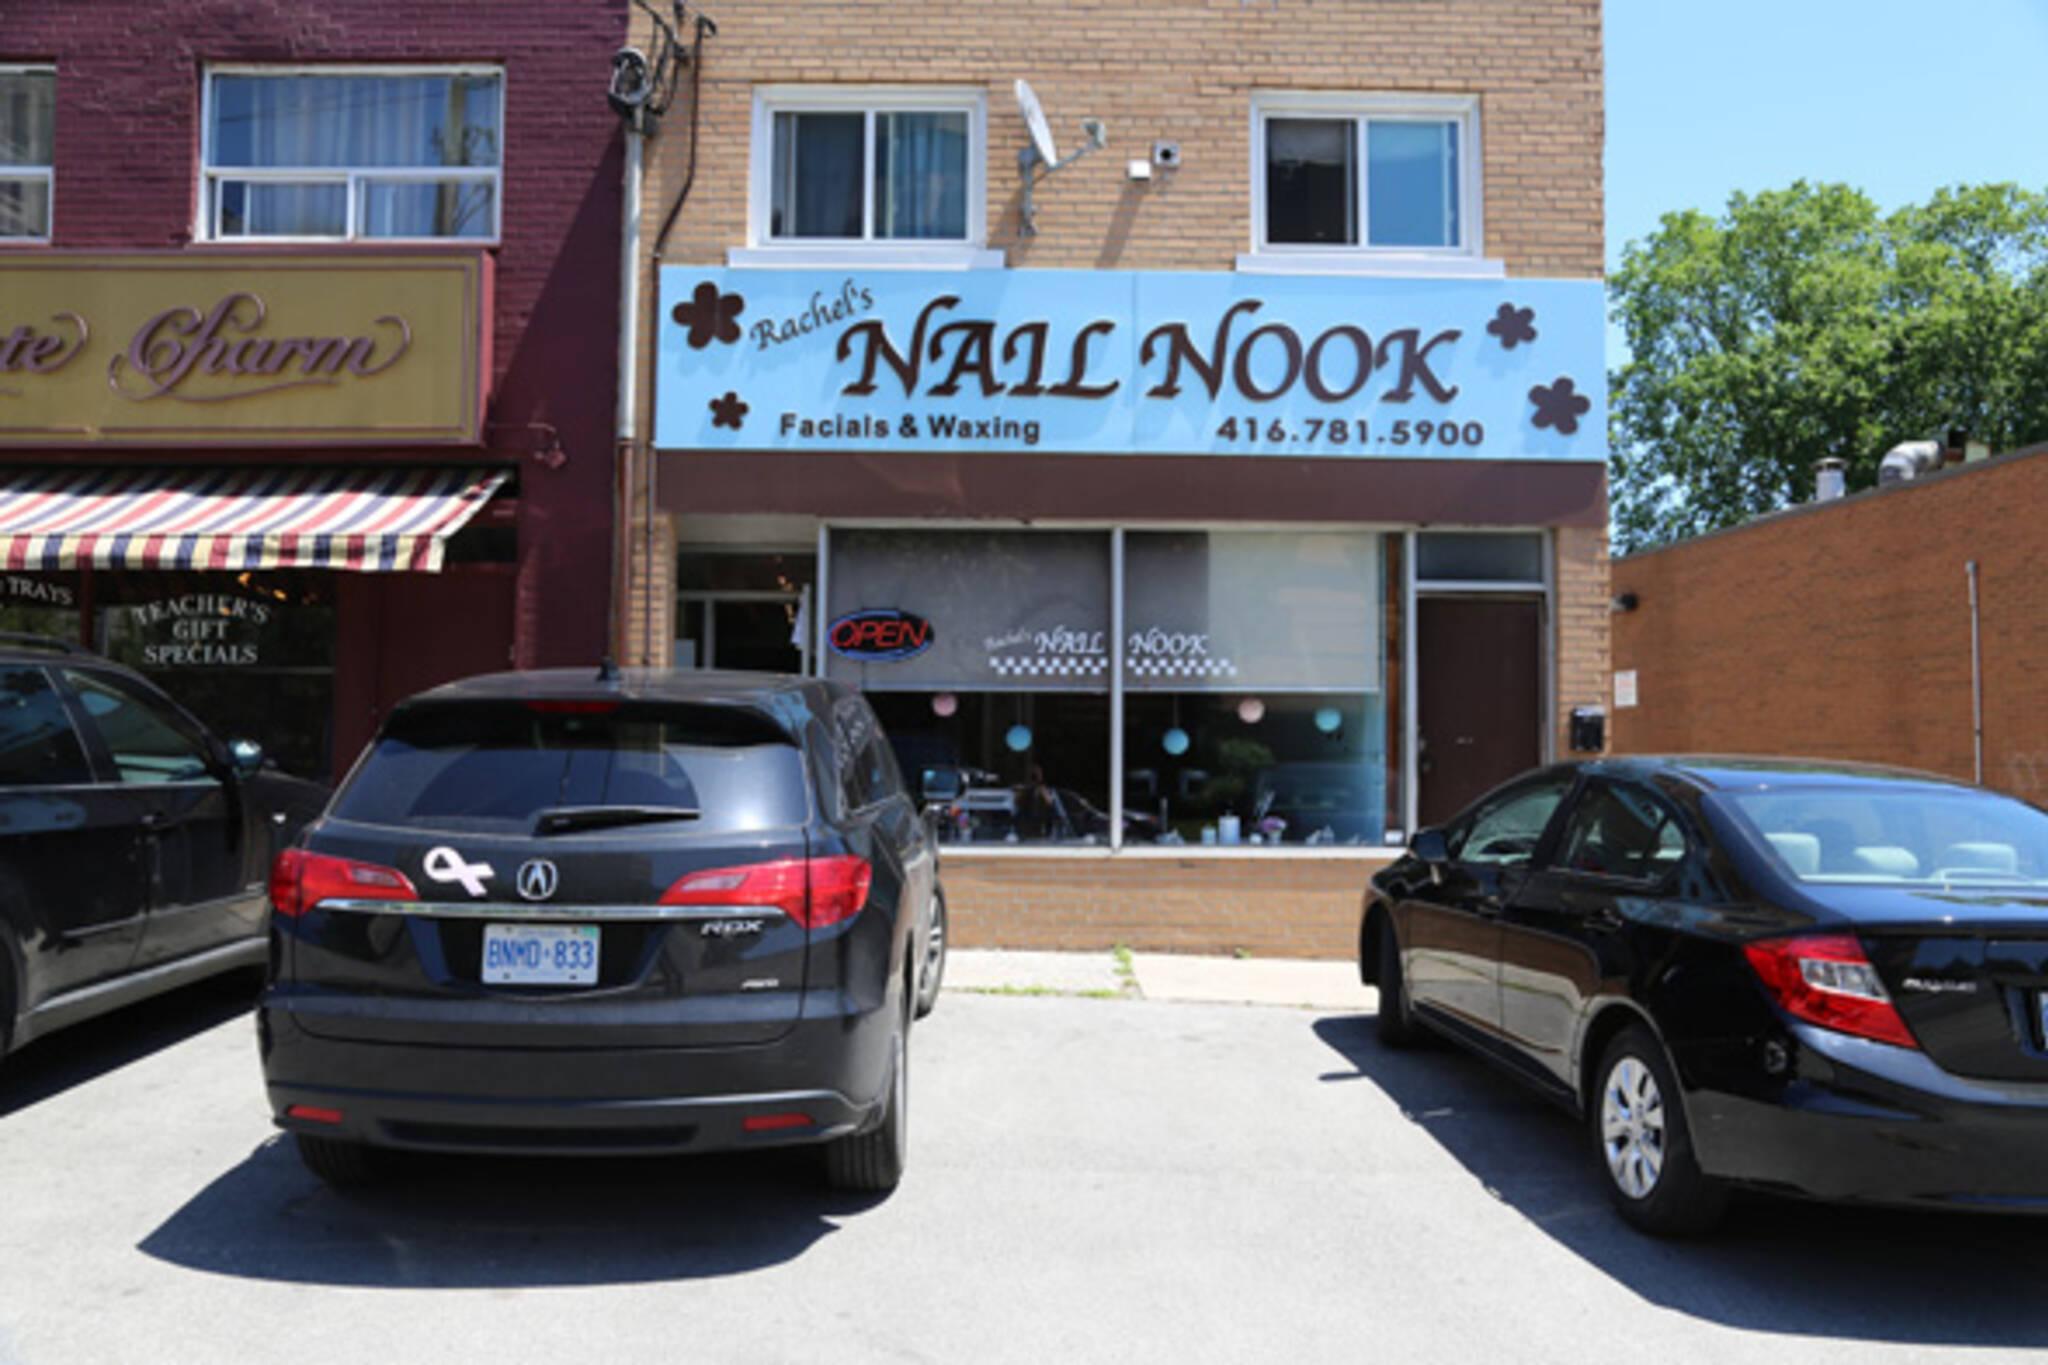 Rachel's Nail Nook Toronto